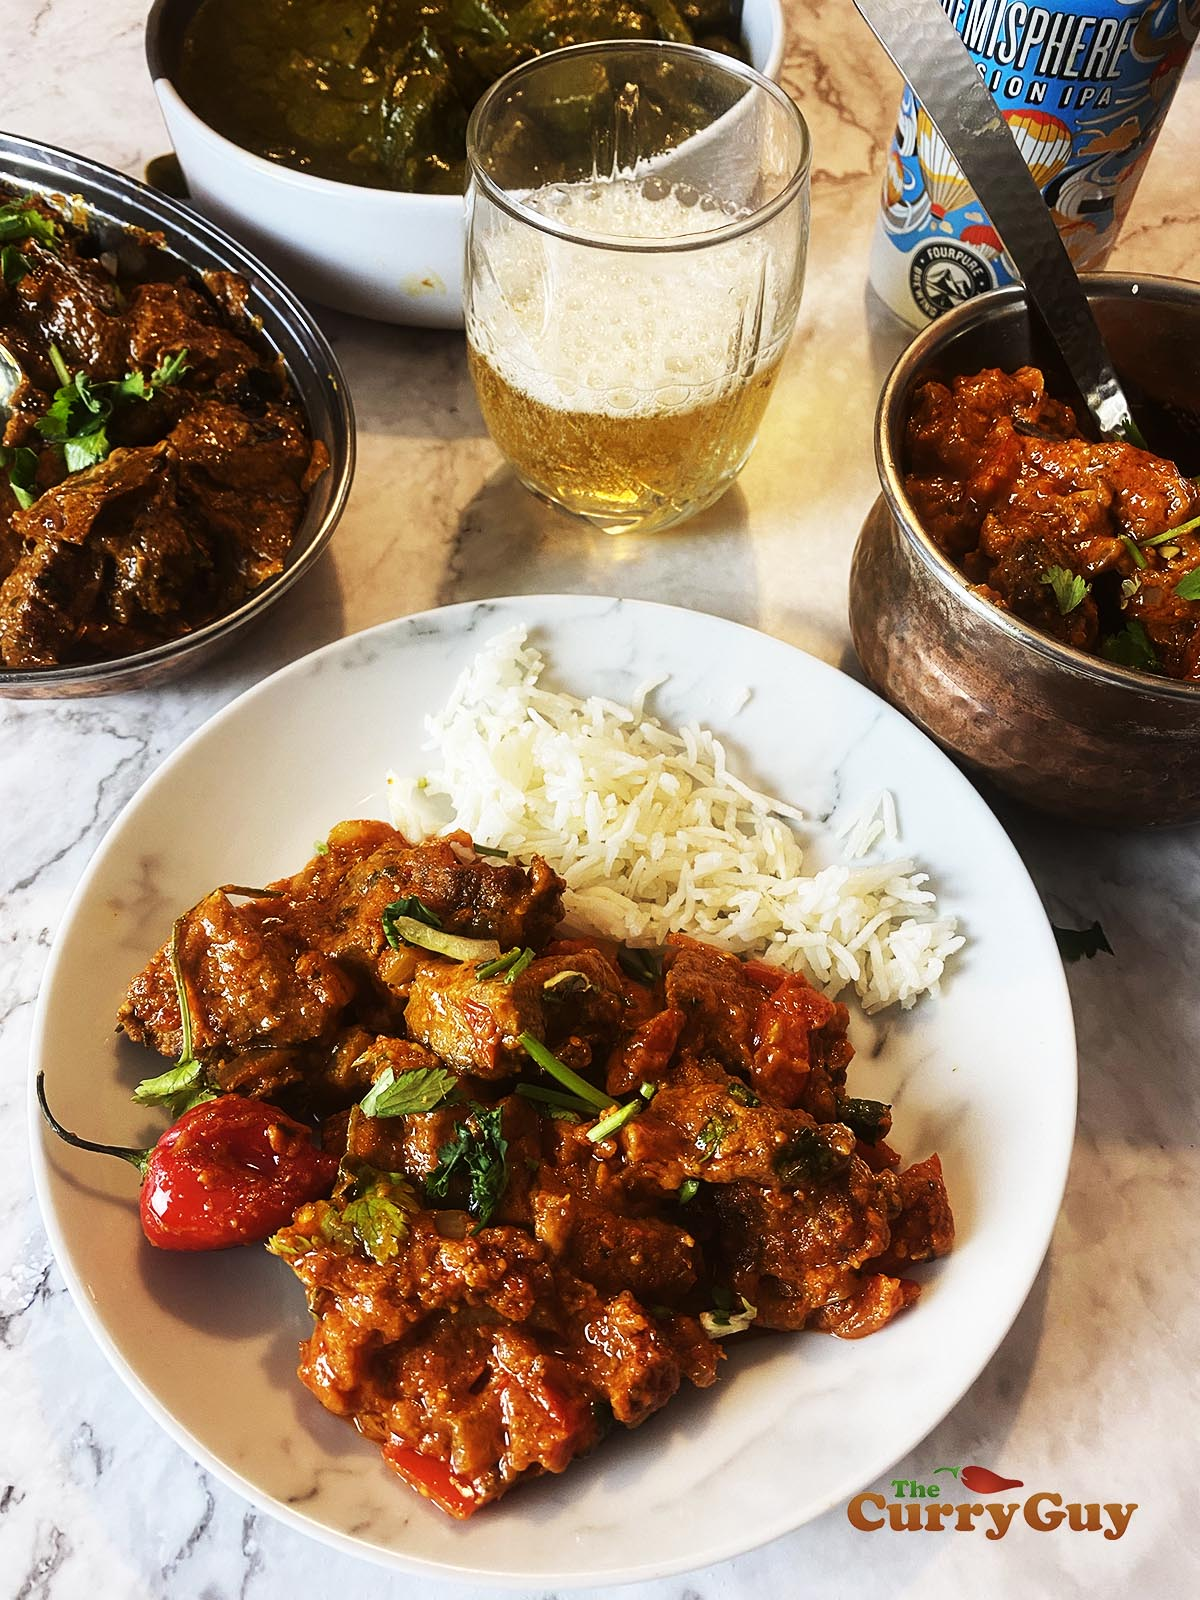 Phaal curry